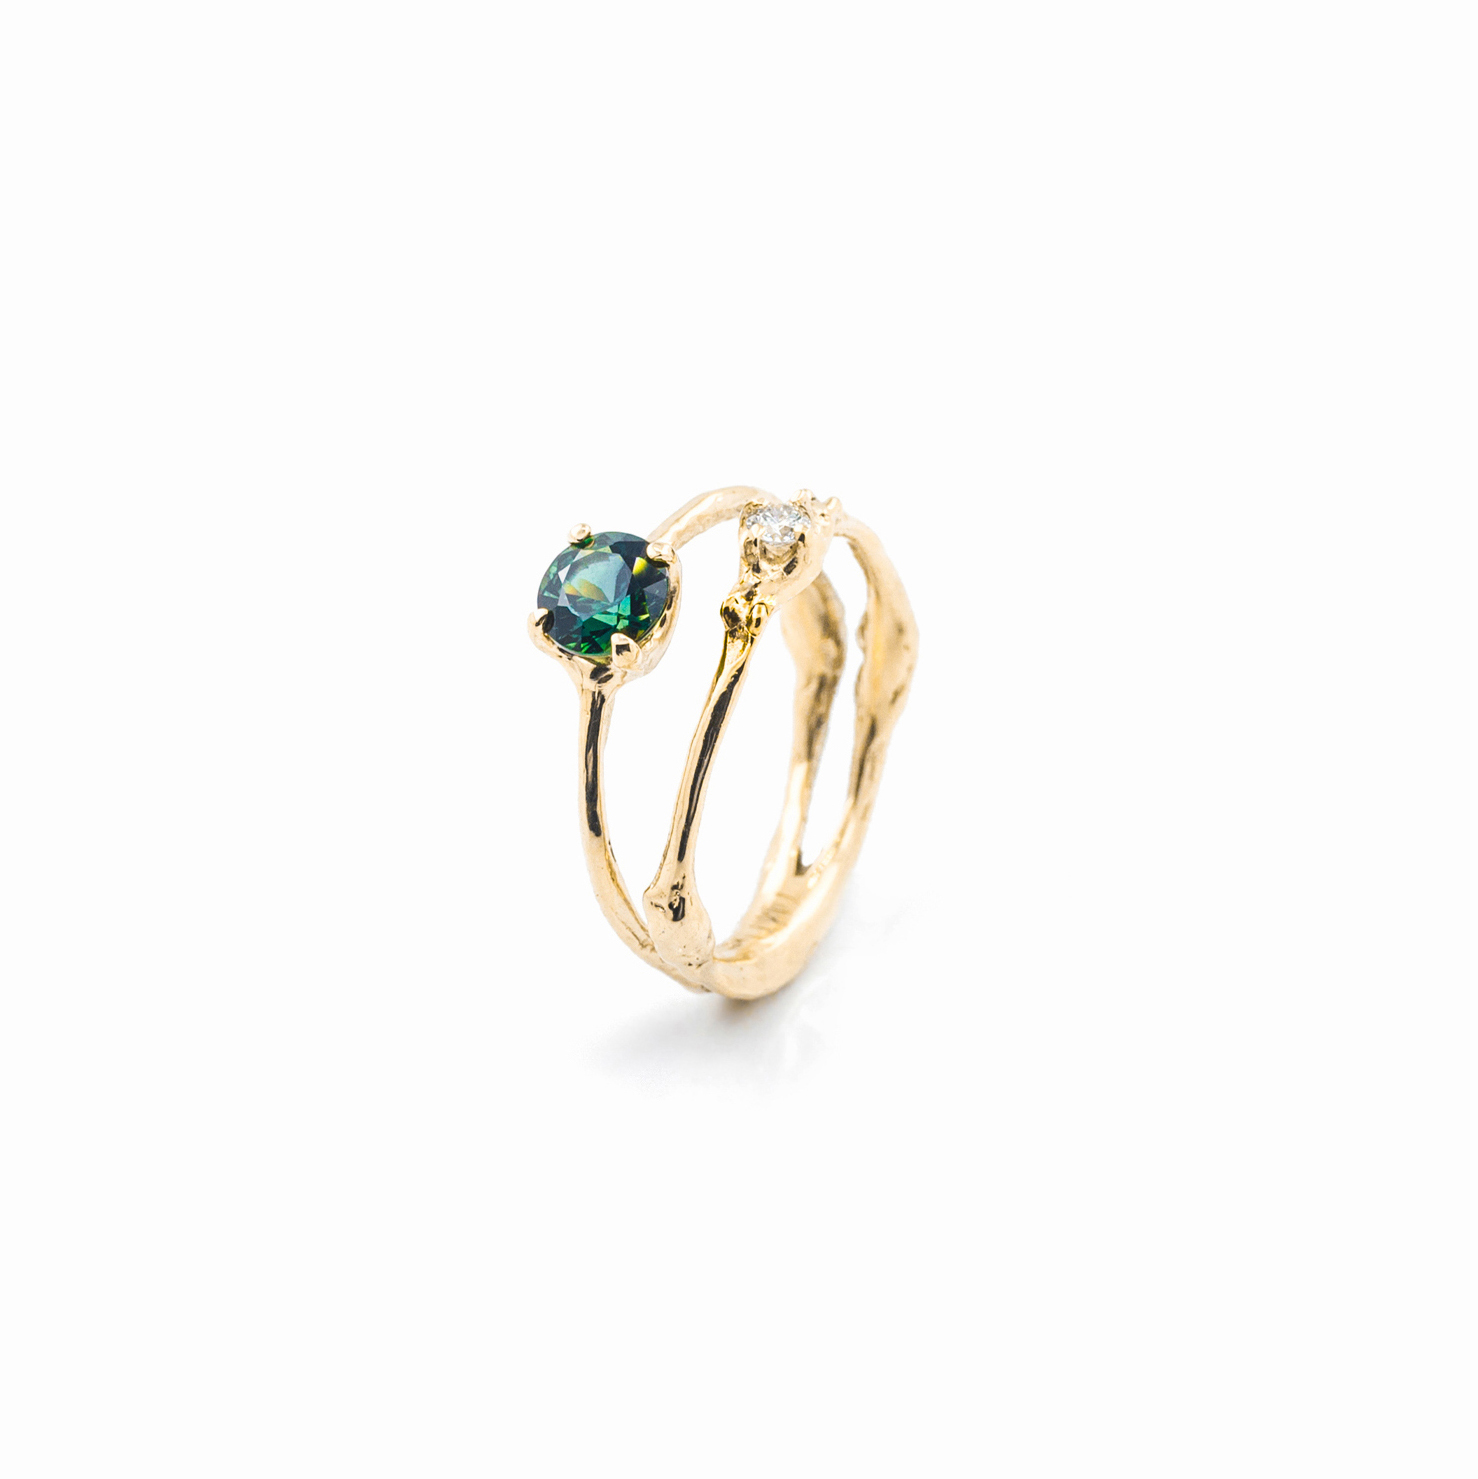 Towers Engagement Ring   18ct yellow gold, sapphire, white diamonds.